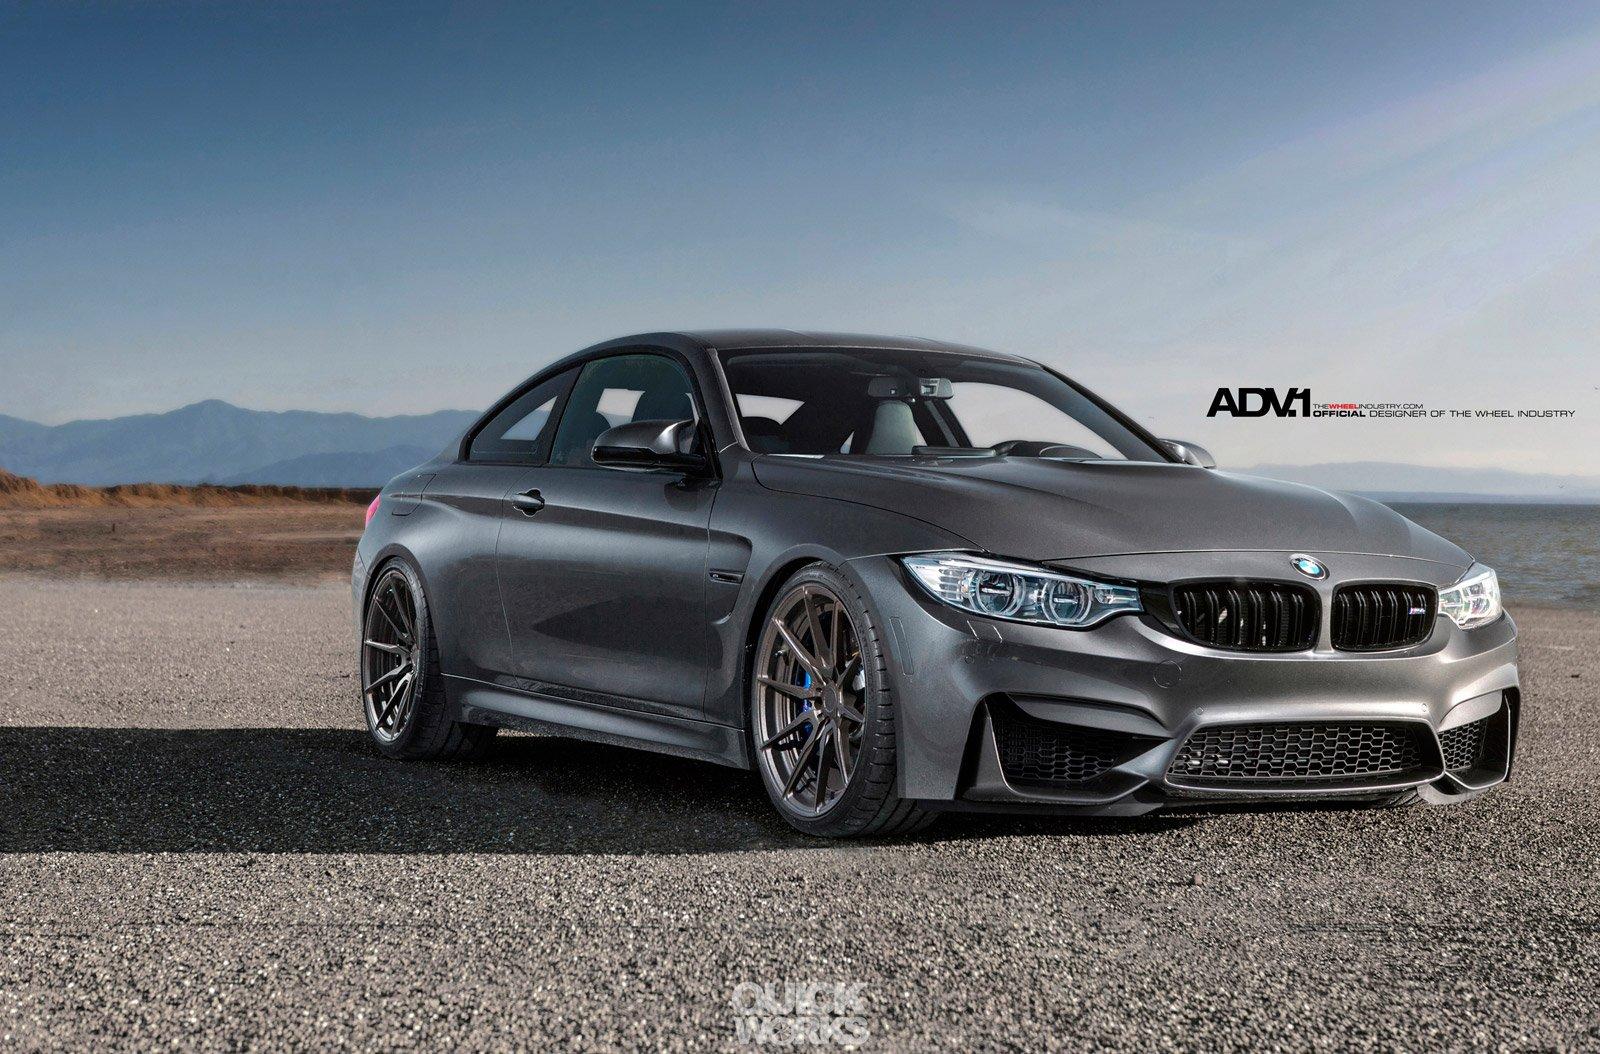 2014_adv1_wheel_tuning_bmw_m4_coupe_cars_1600x1054.jpg